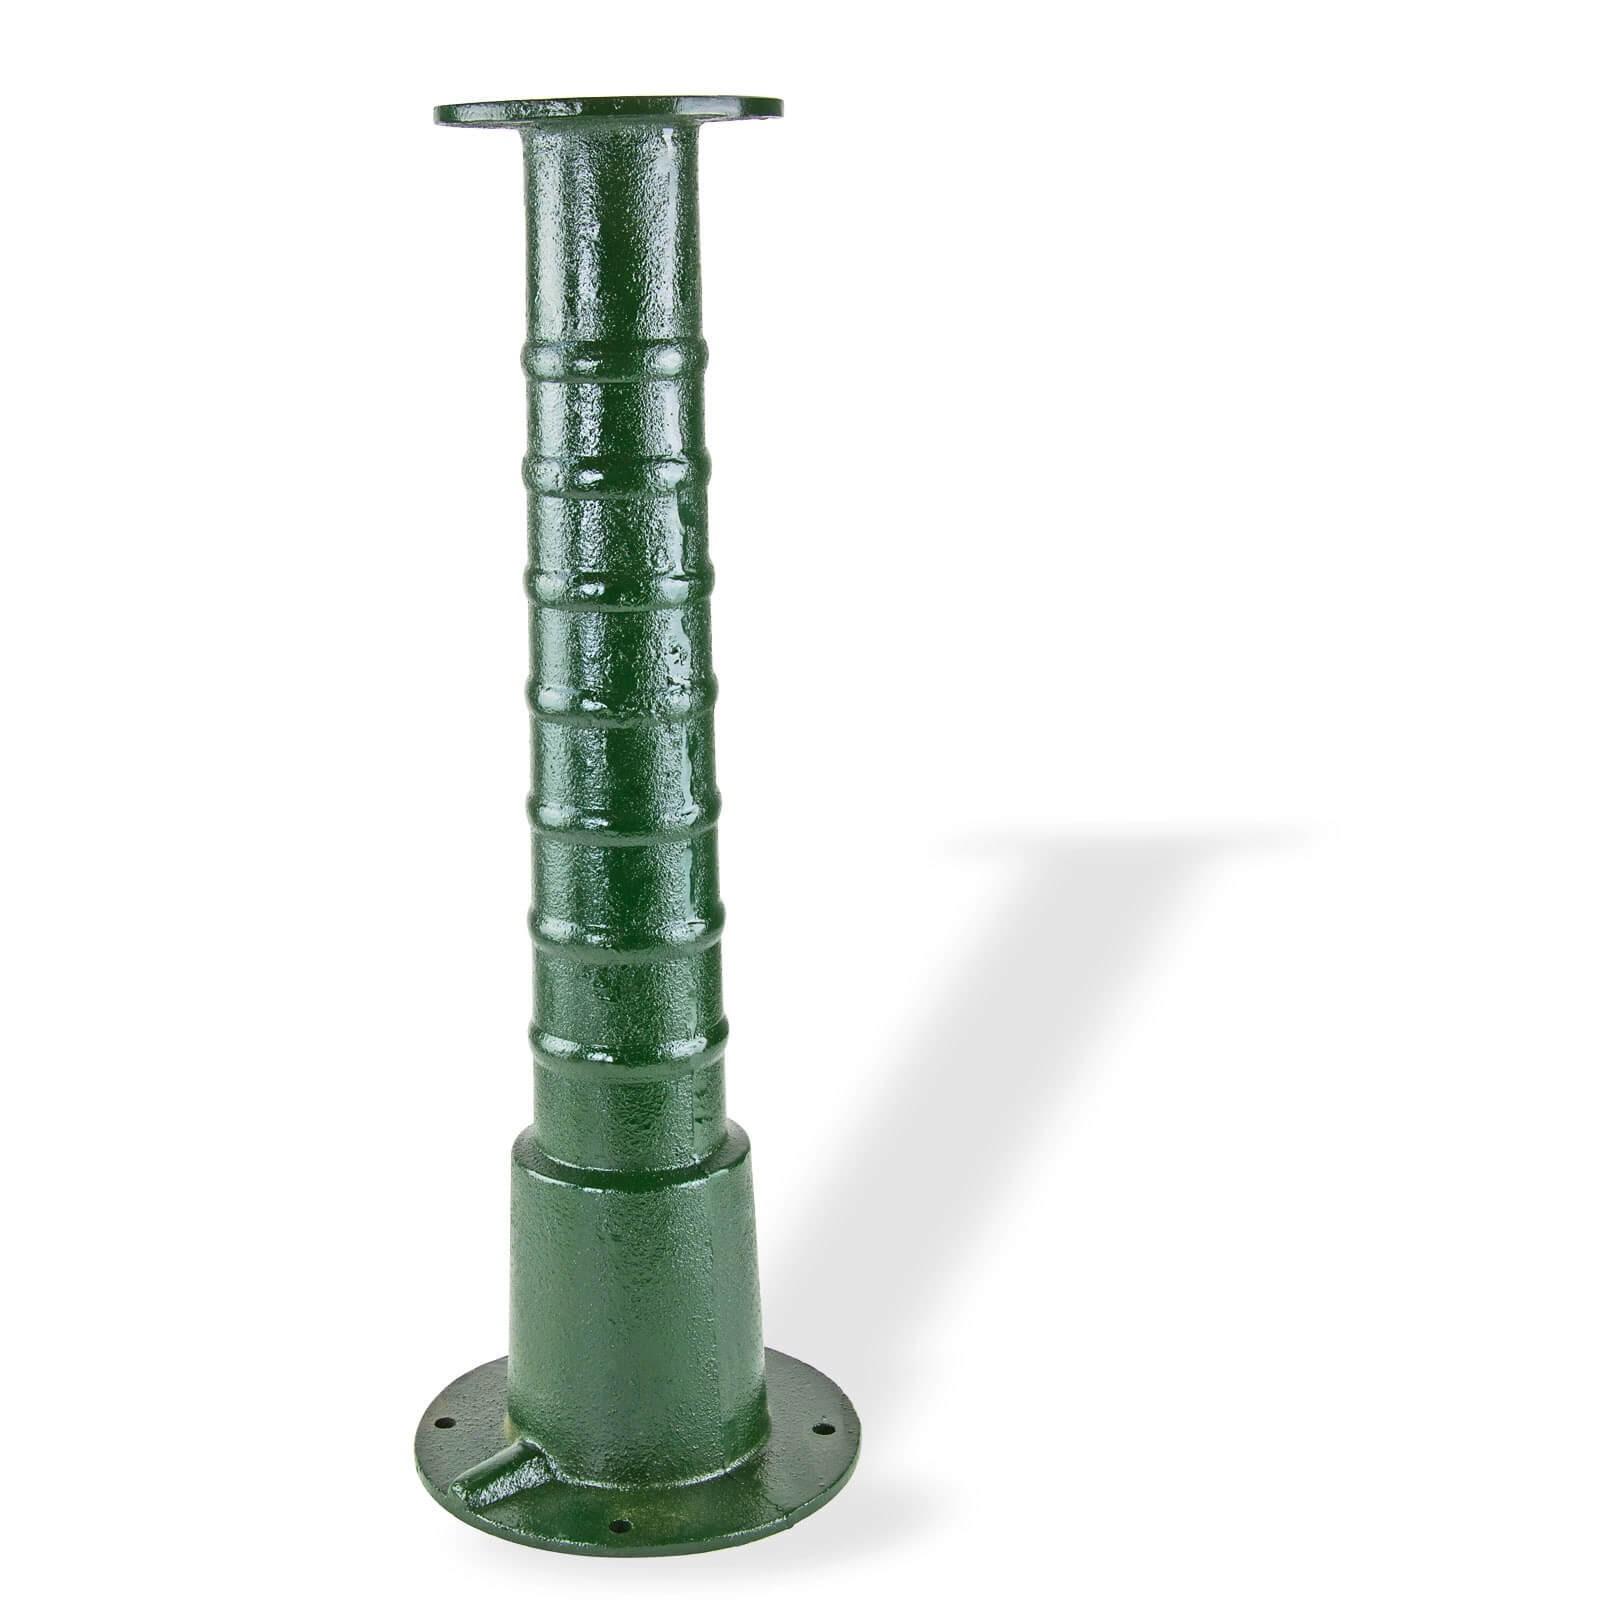 Dema Pumpenständer Handschwengelpumpe Gartenpumpe Wasserpumpe Schwengelpumpe Klassik 30993